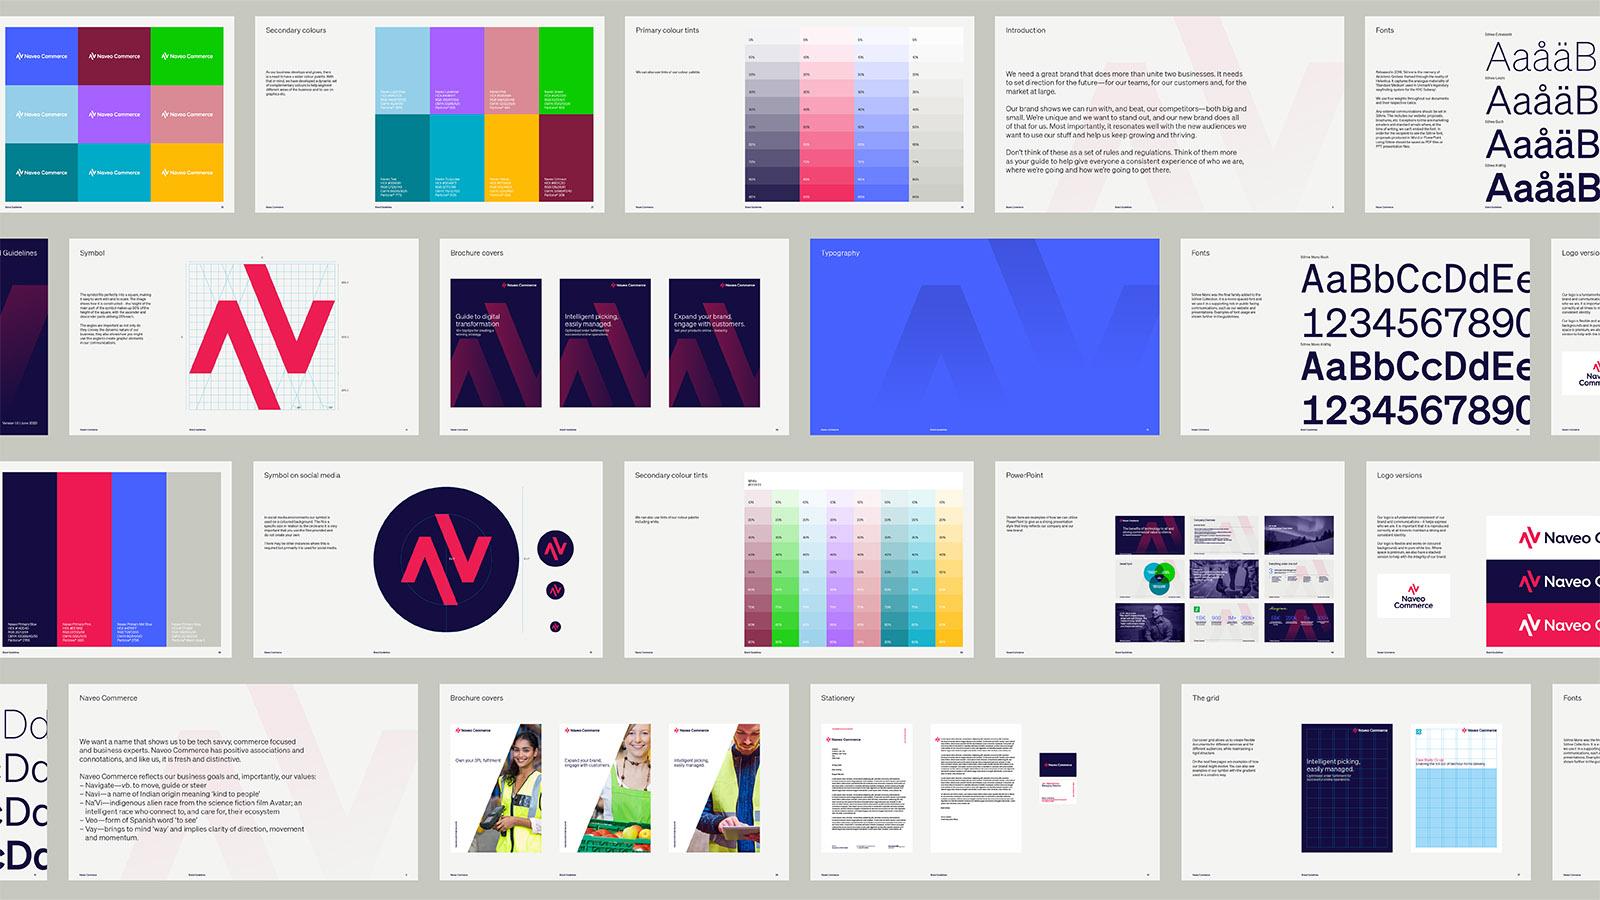 naveo commerce brand guidelines design by Leeds based Freelance Designer Neil Holroyd